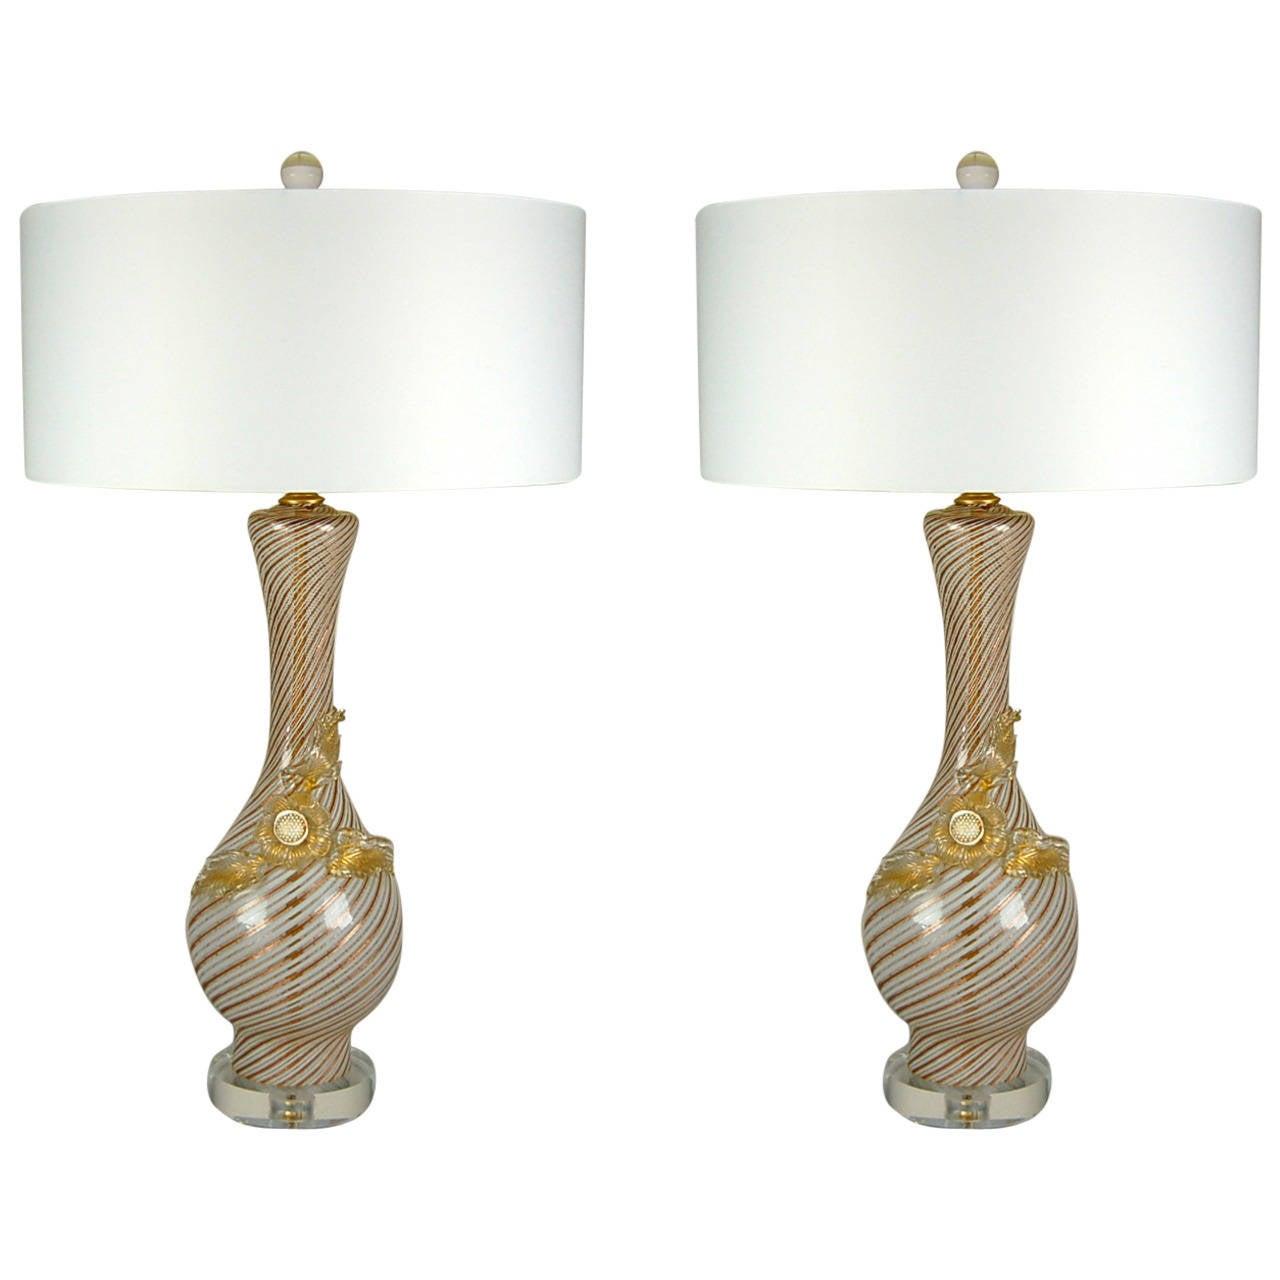 Murano gl floor lamp murano gl floor lamps 173 for at 1stdibs - Pair Of Vintage Filigrana Murano Lamps By Dino Martens